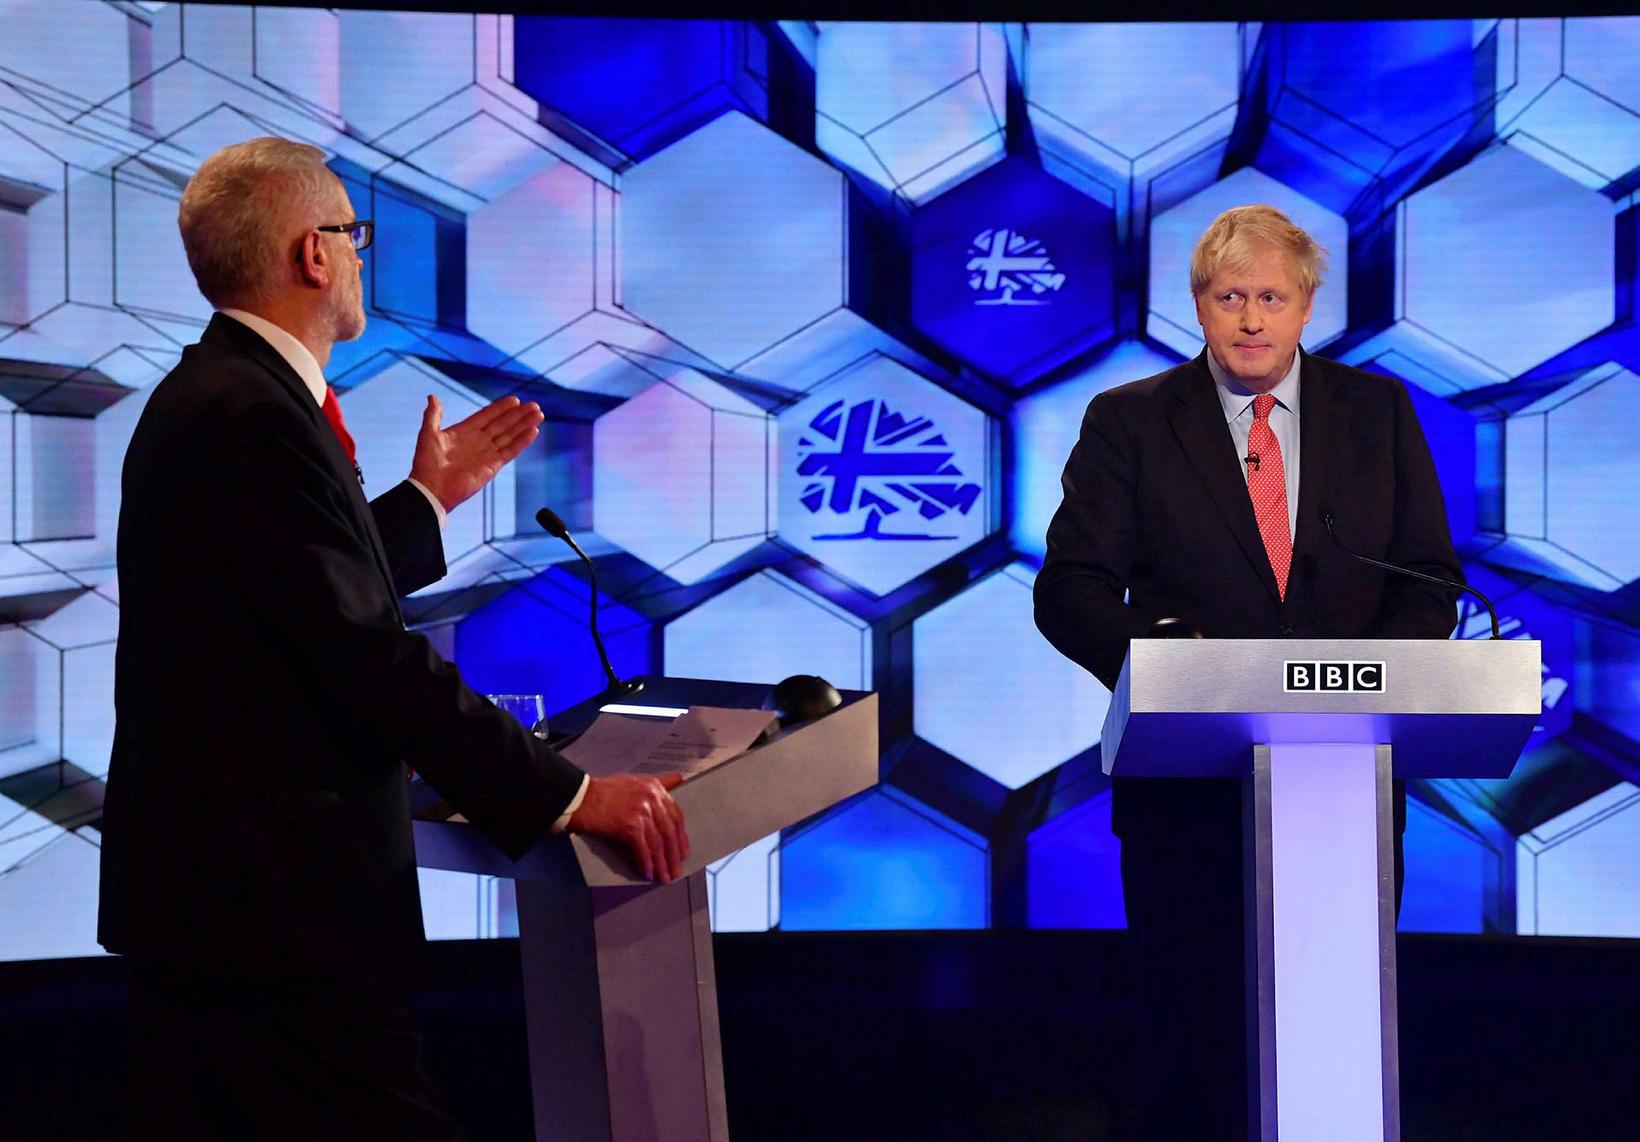 Jeremy Corbyn og Boris Johnson takast á í sjónvarpssal.